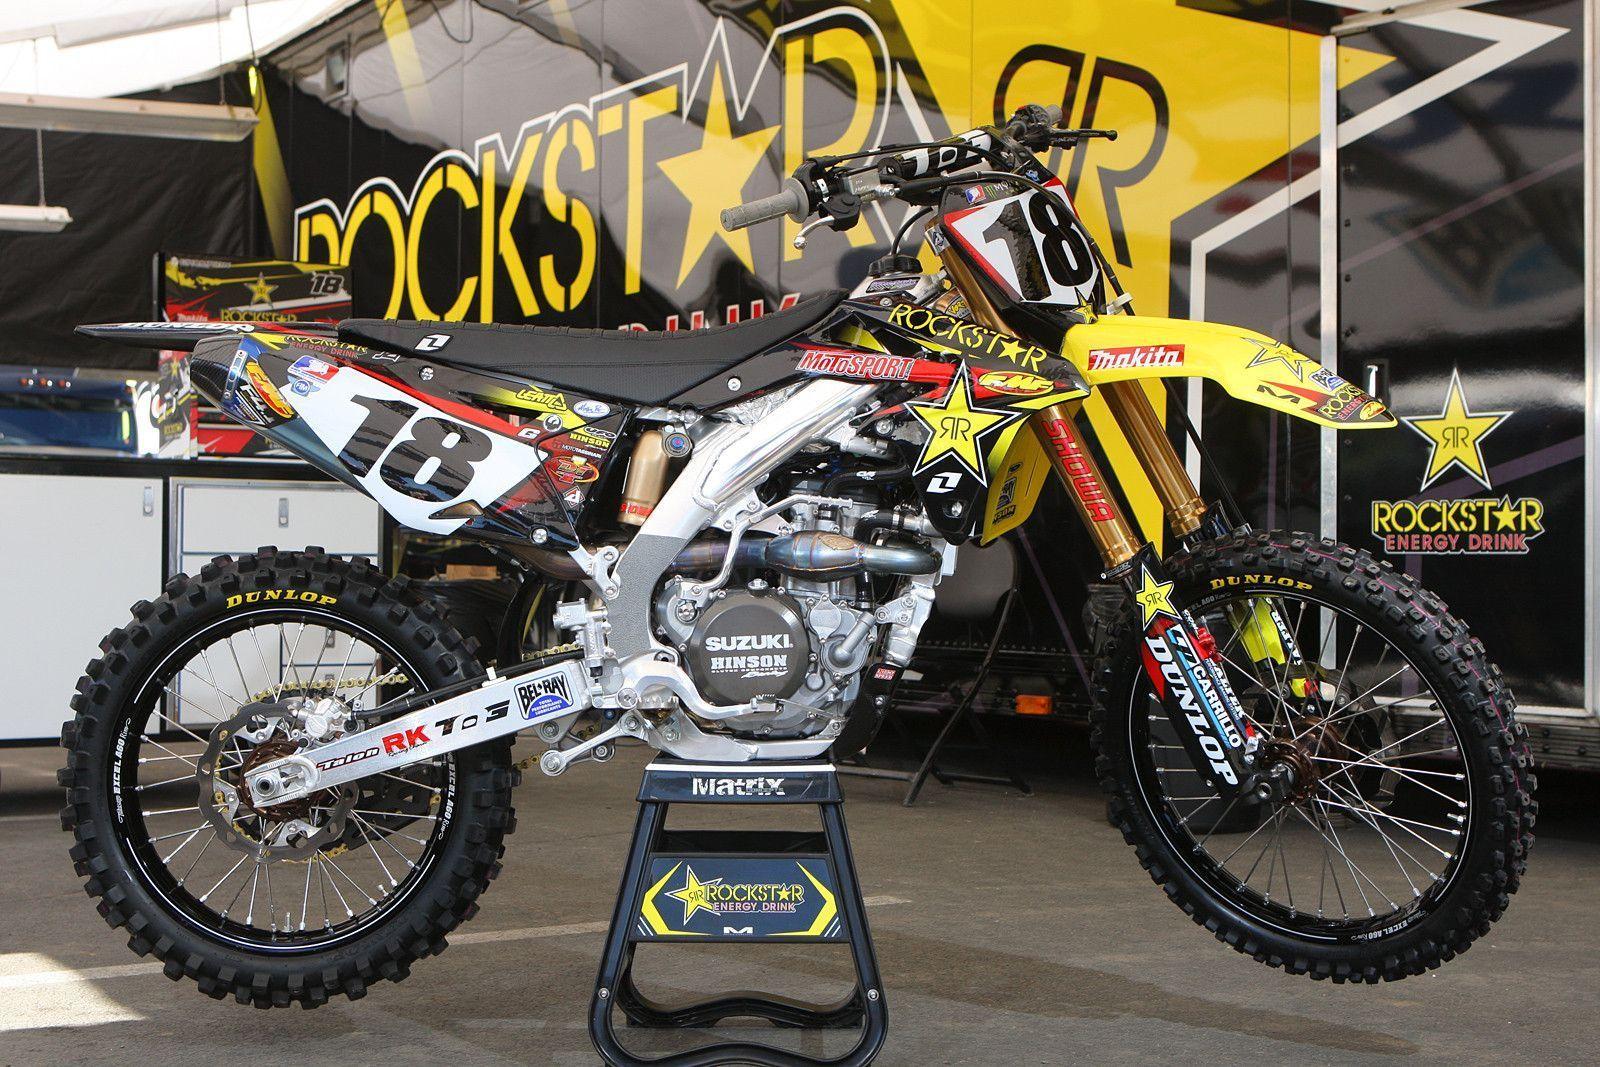 Suzuki Rm Z 450 Team Rockstar Suzuki David Millsaps Supercross 2013 Motorcross Bike Enduro Motocross Racing Motorcycles